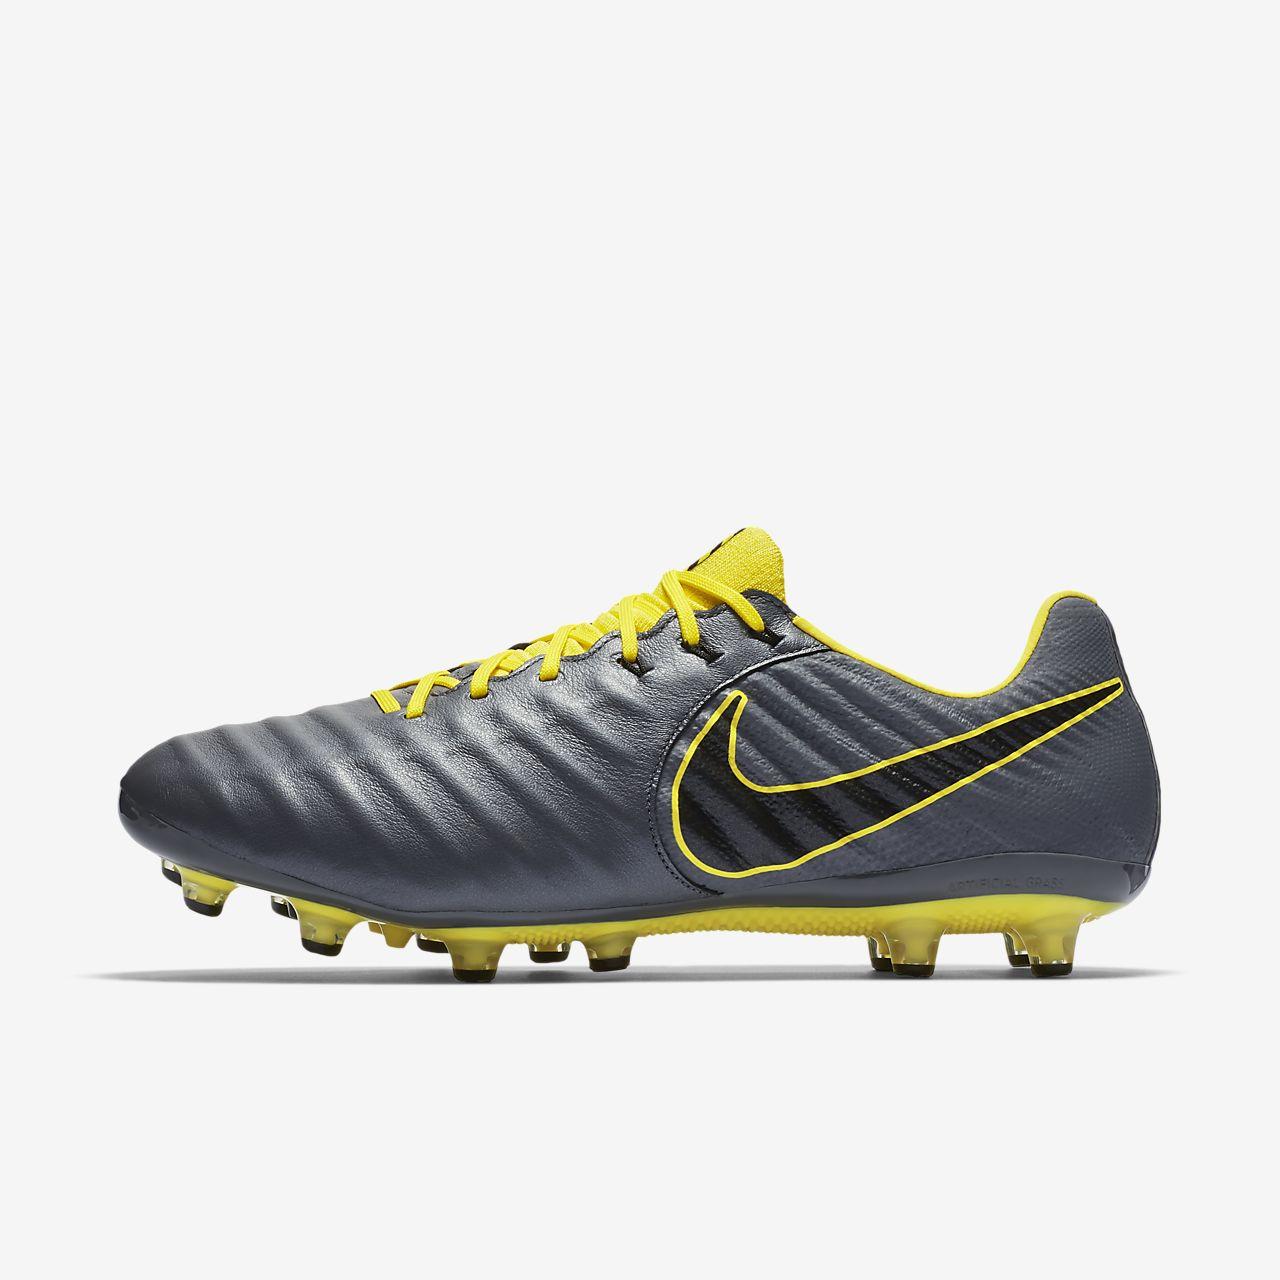 Nike kunstgras Vii Pro Elite Nl Ag Voetbalschoen Legend S6nzrS